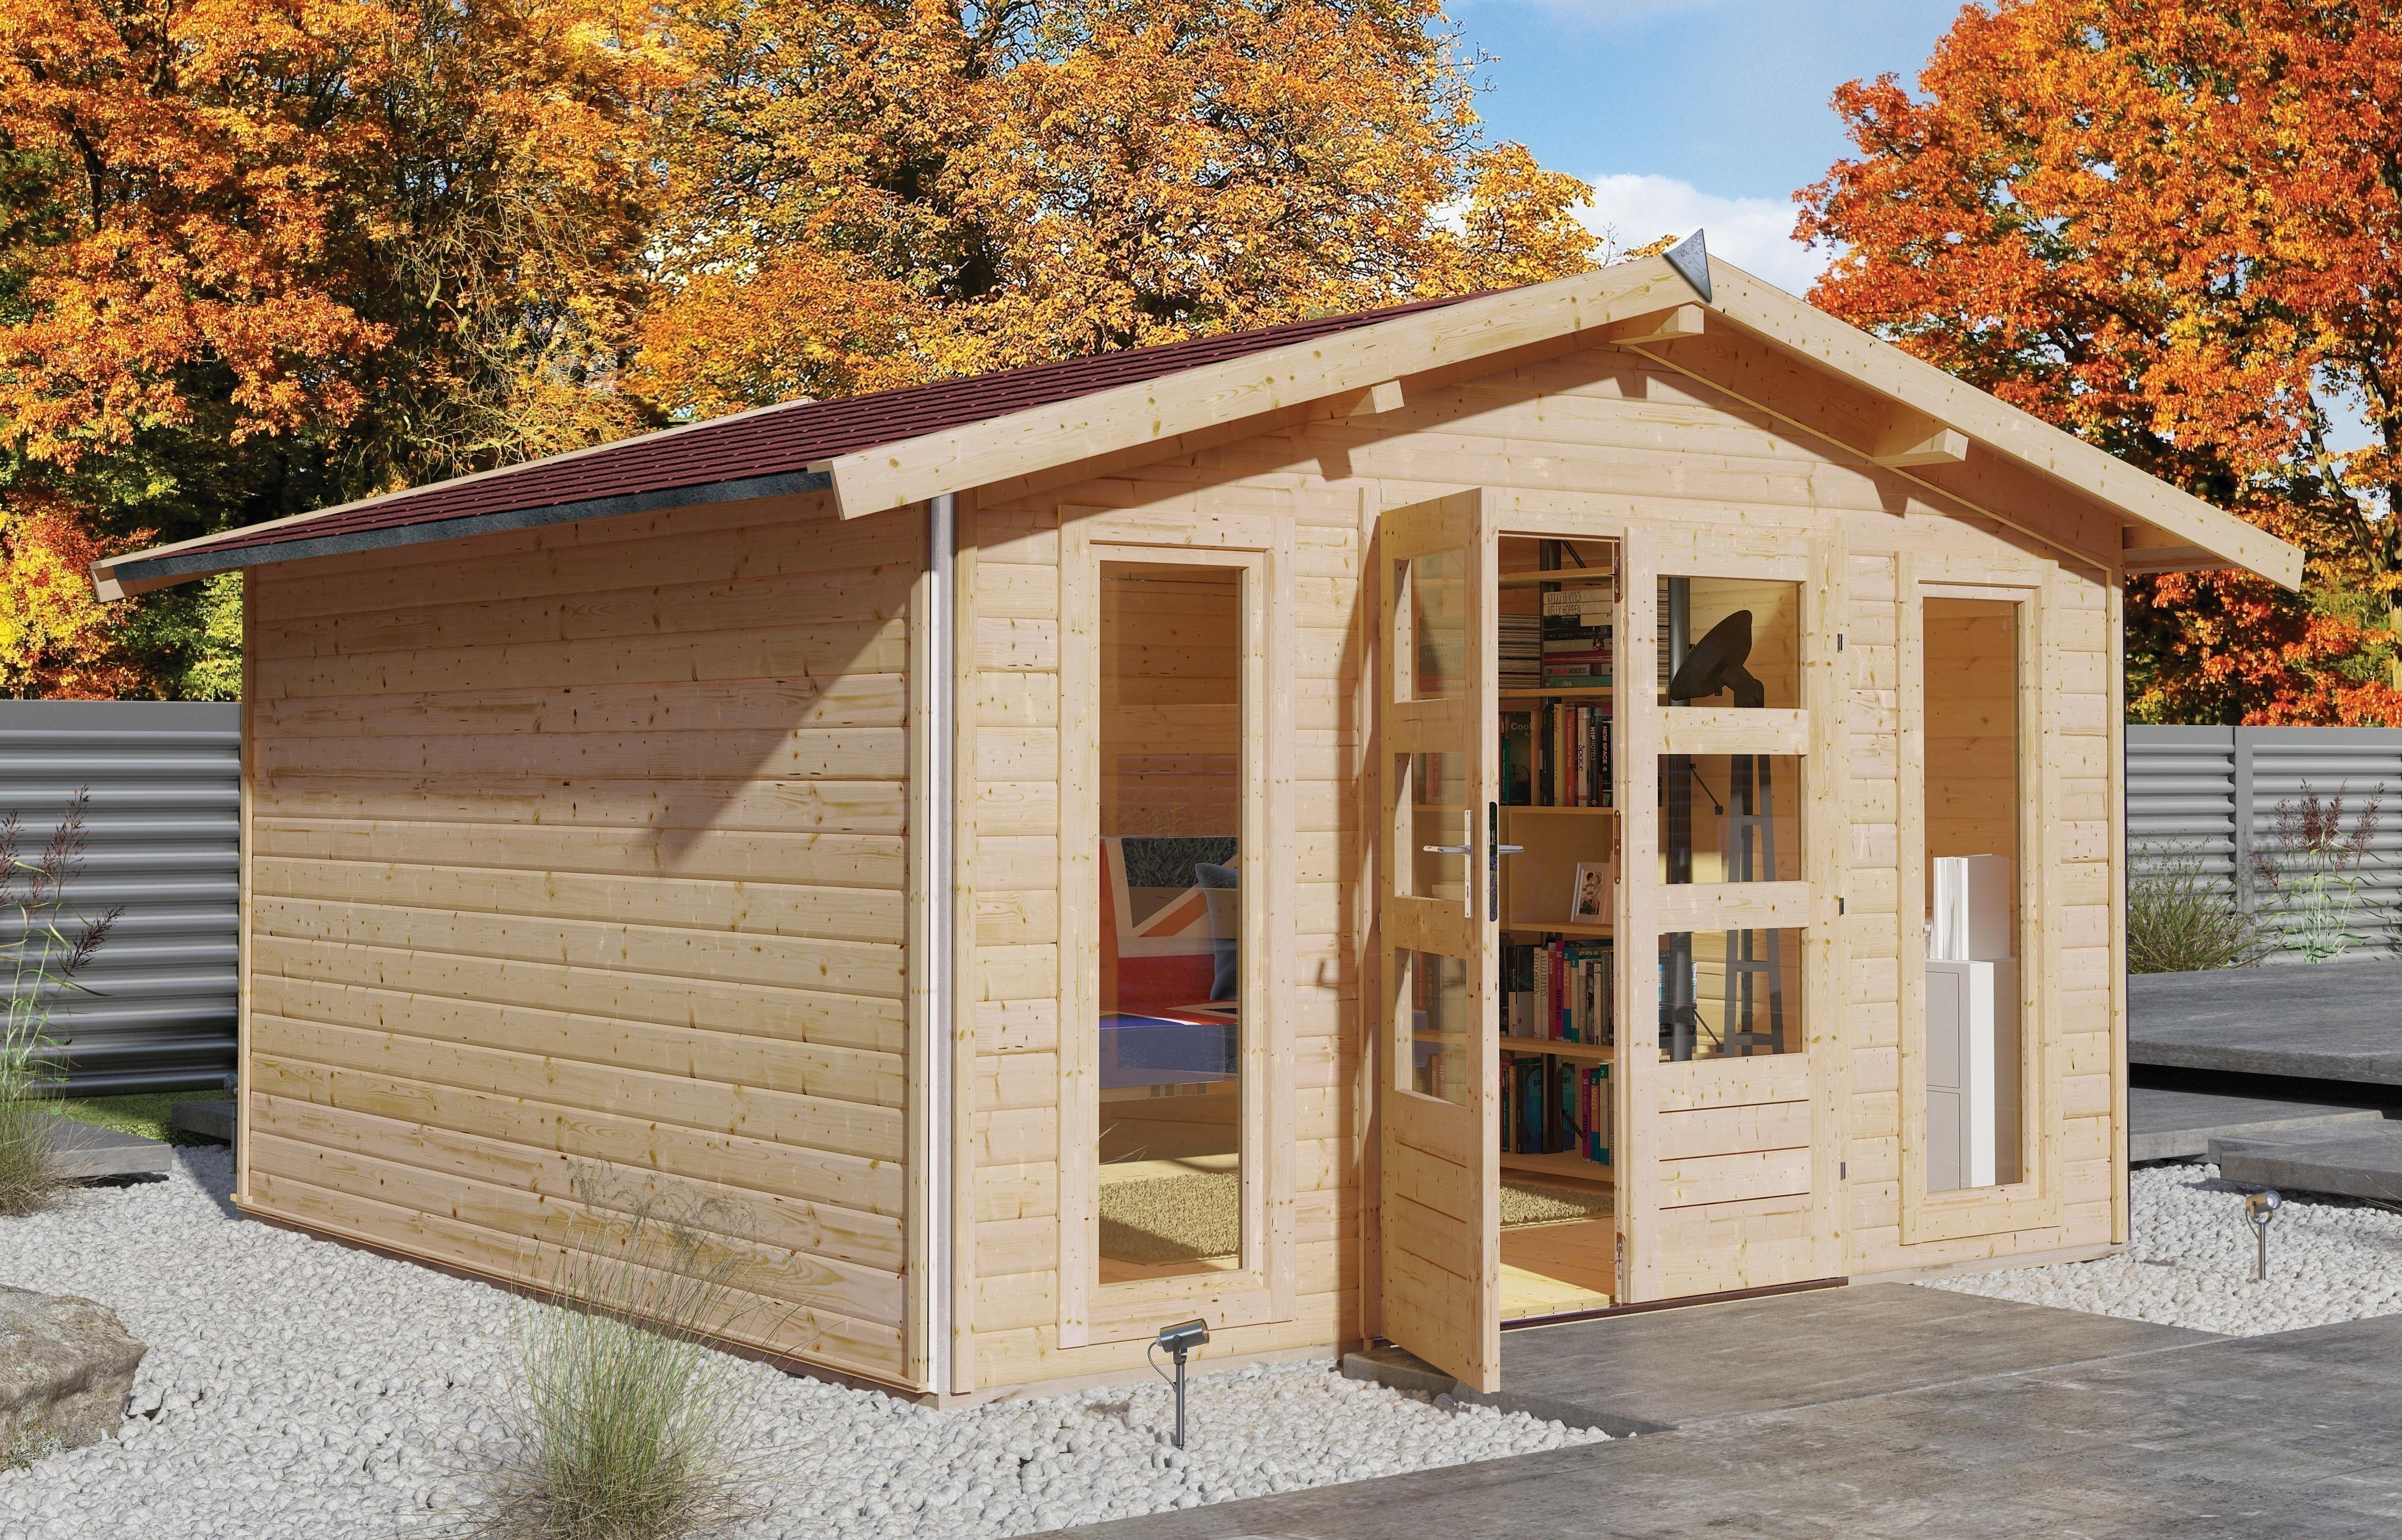 karibu gartenhaus 40mm bensburg 1 grau 434x343cm bei. Black Bedroom Furniture Sets. Home Design Ideas